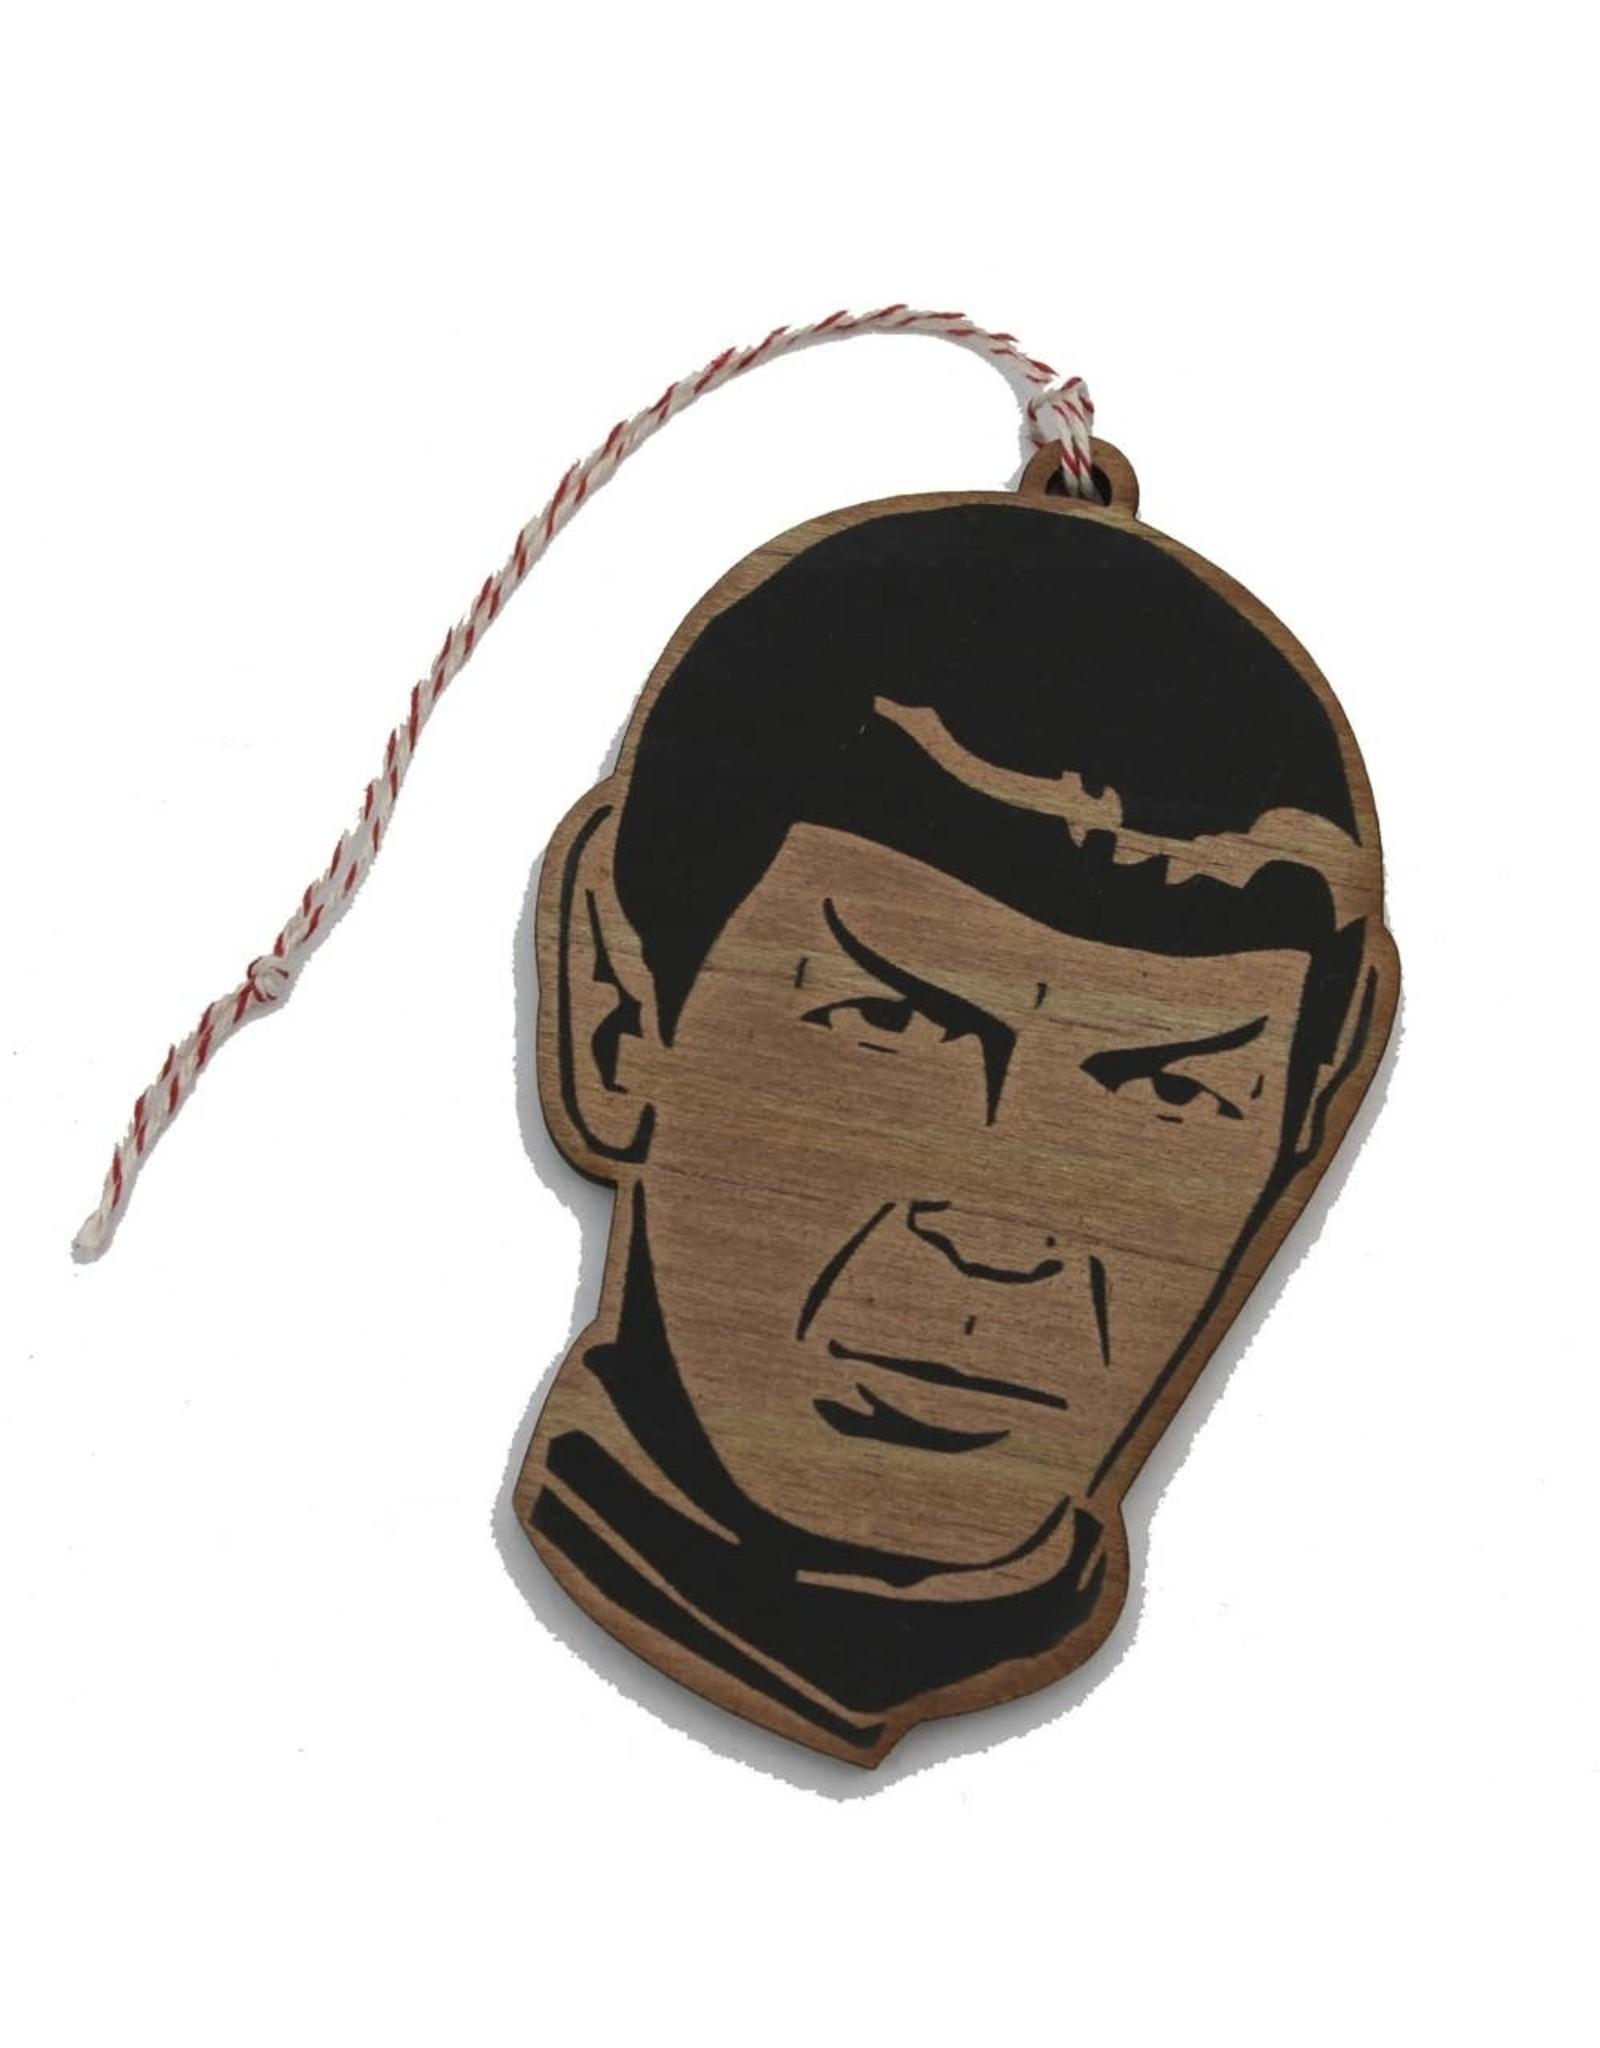 Lettercraft Ornament - Spock